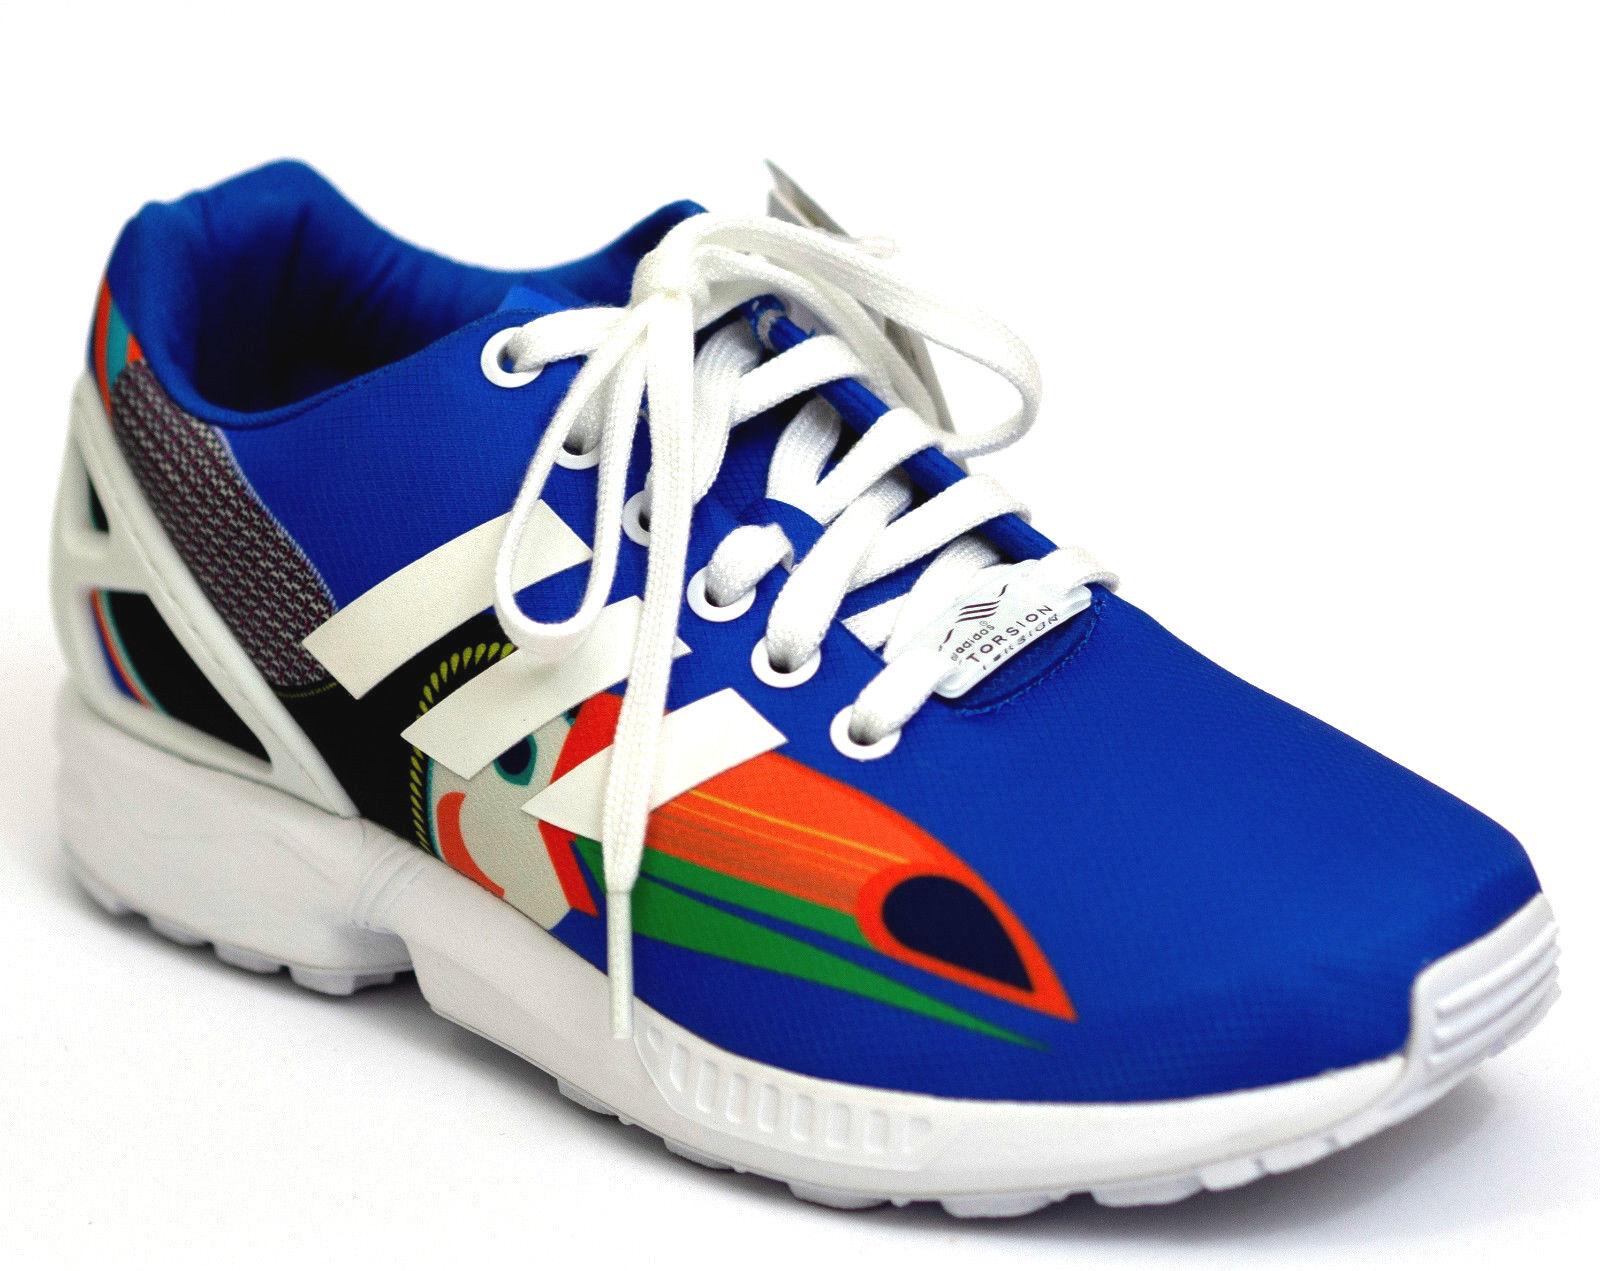 Adidas Originals ZX FLUX W Torsion 38 NiedrigTop Sneaker Turnschuhe Blau Schwarz NEU